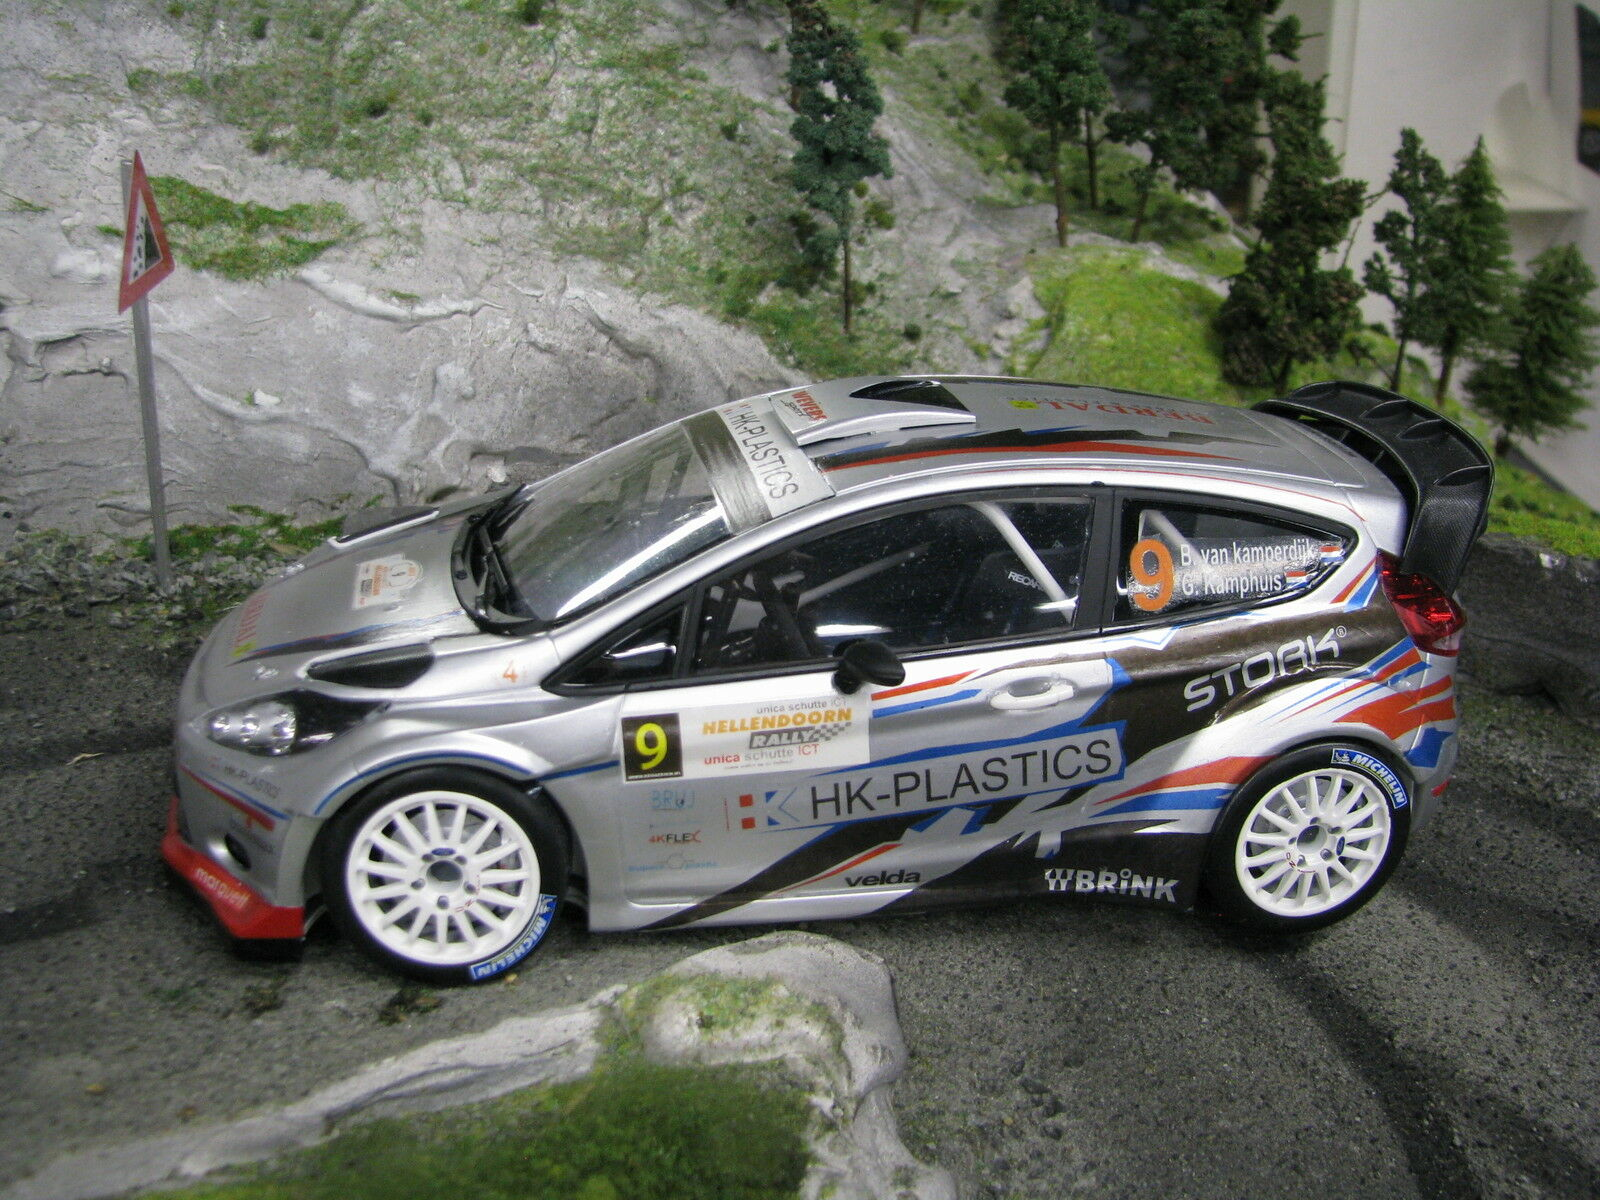 Minichamps Ford Fiesta RS WRC 2013 1 18 18 18  9 v. Kamperdijk   Kamphuis (MCC) 563